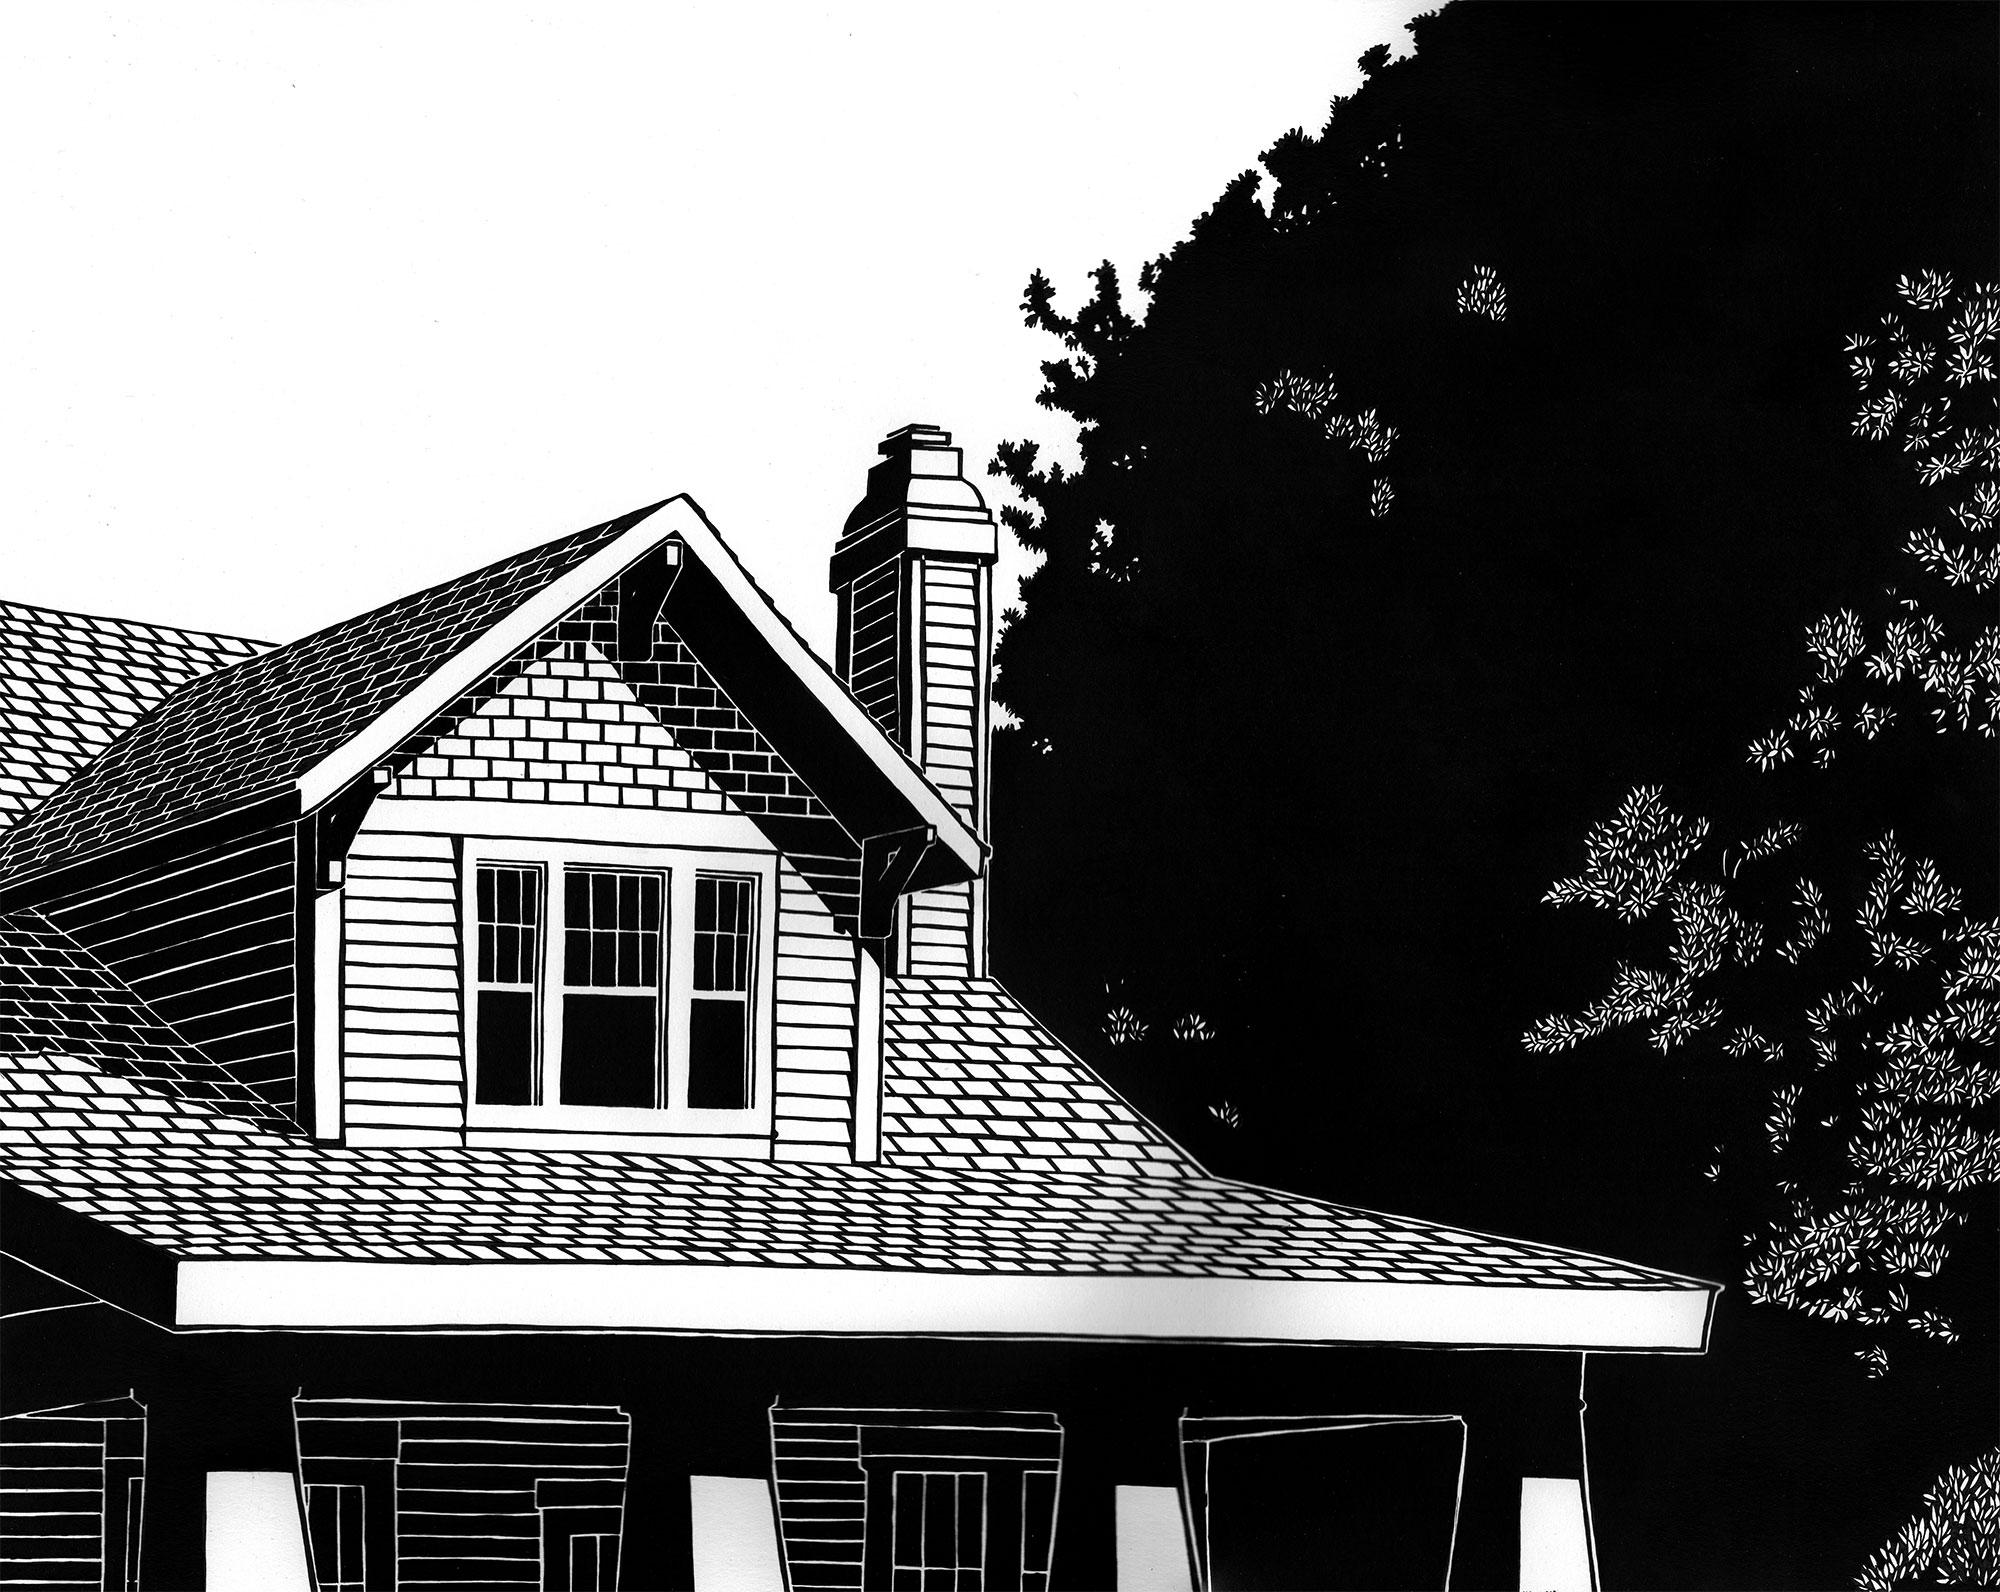 Single Family House #26